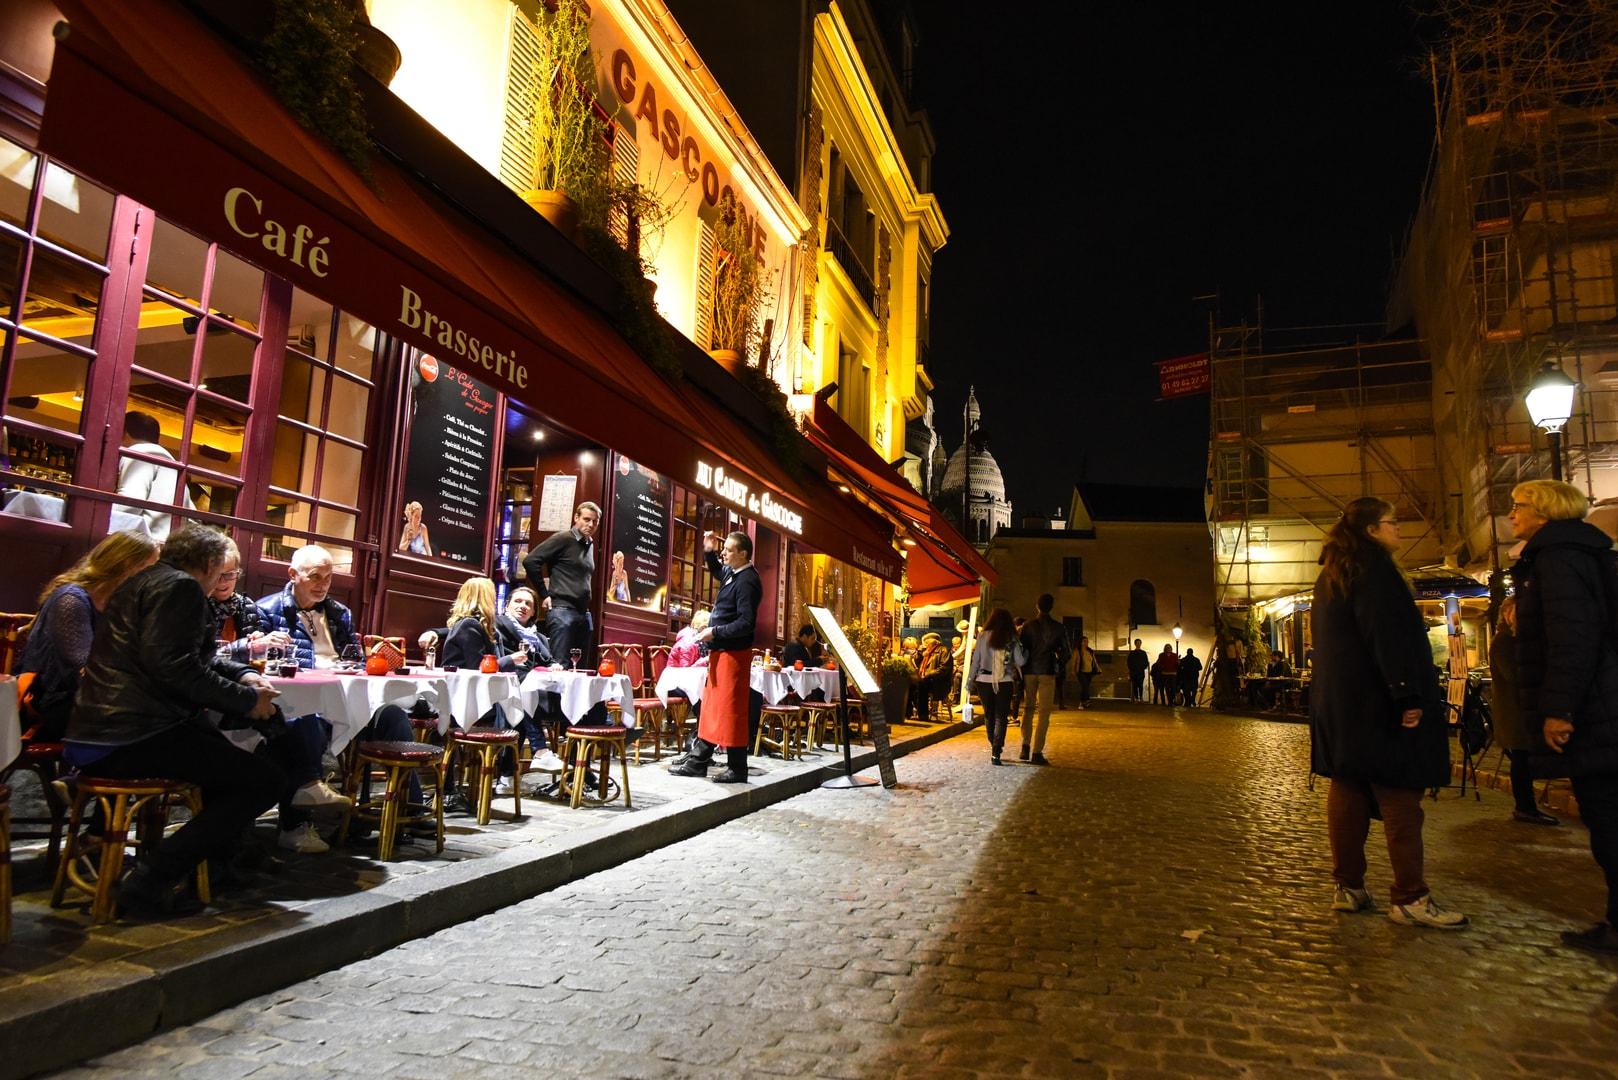 Cafe Brasserie in Paris